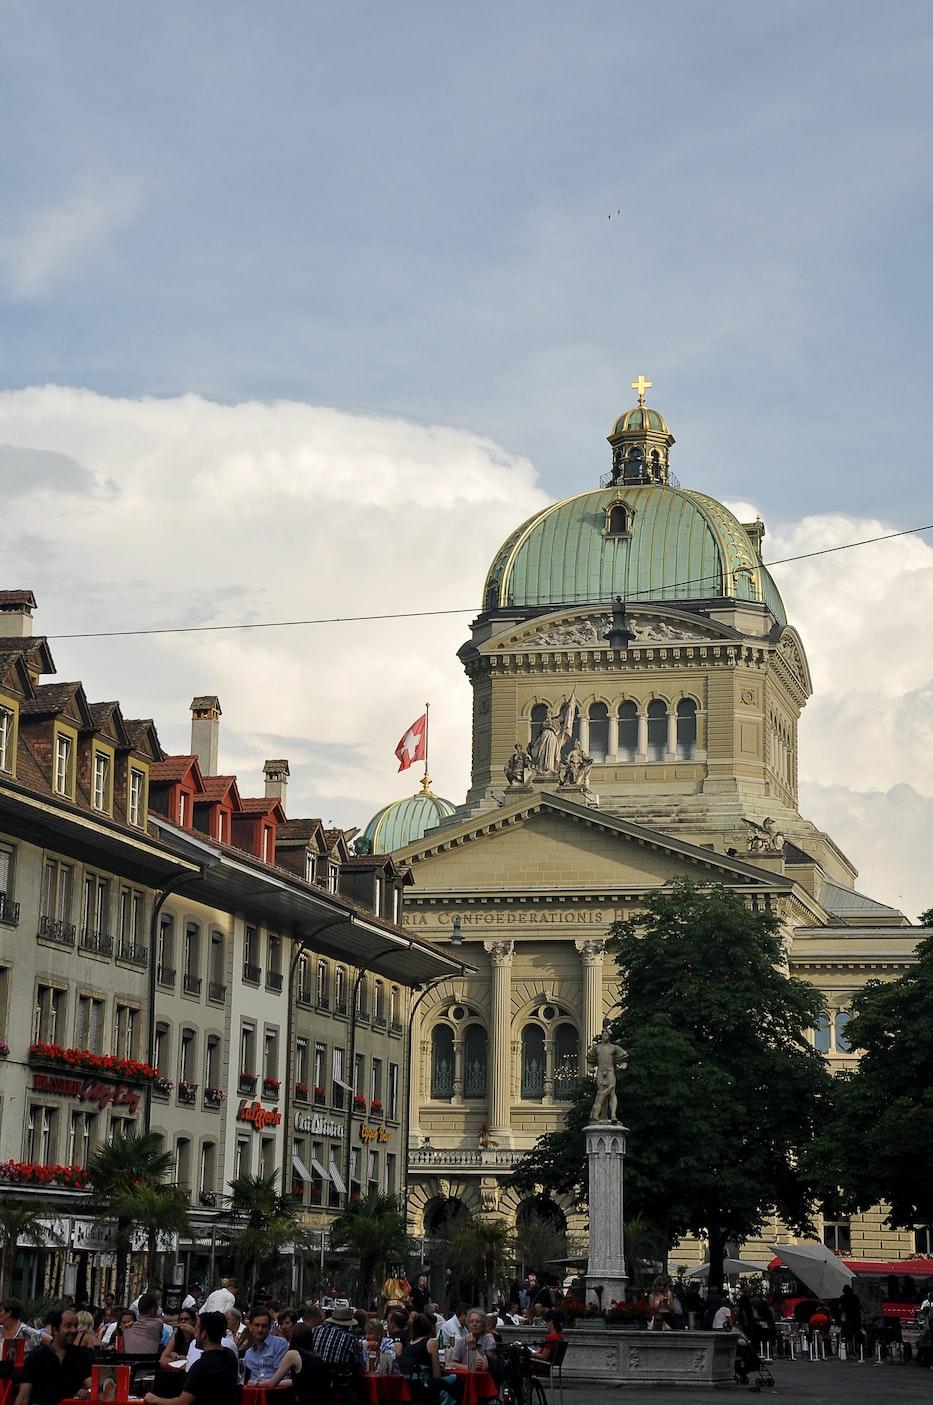 A building in Bern, Switzerland